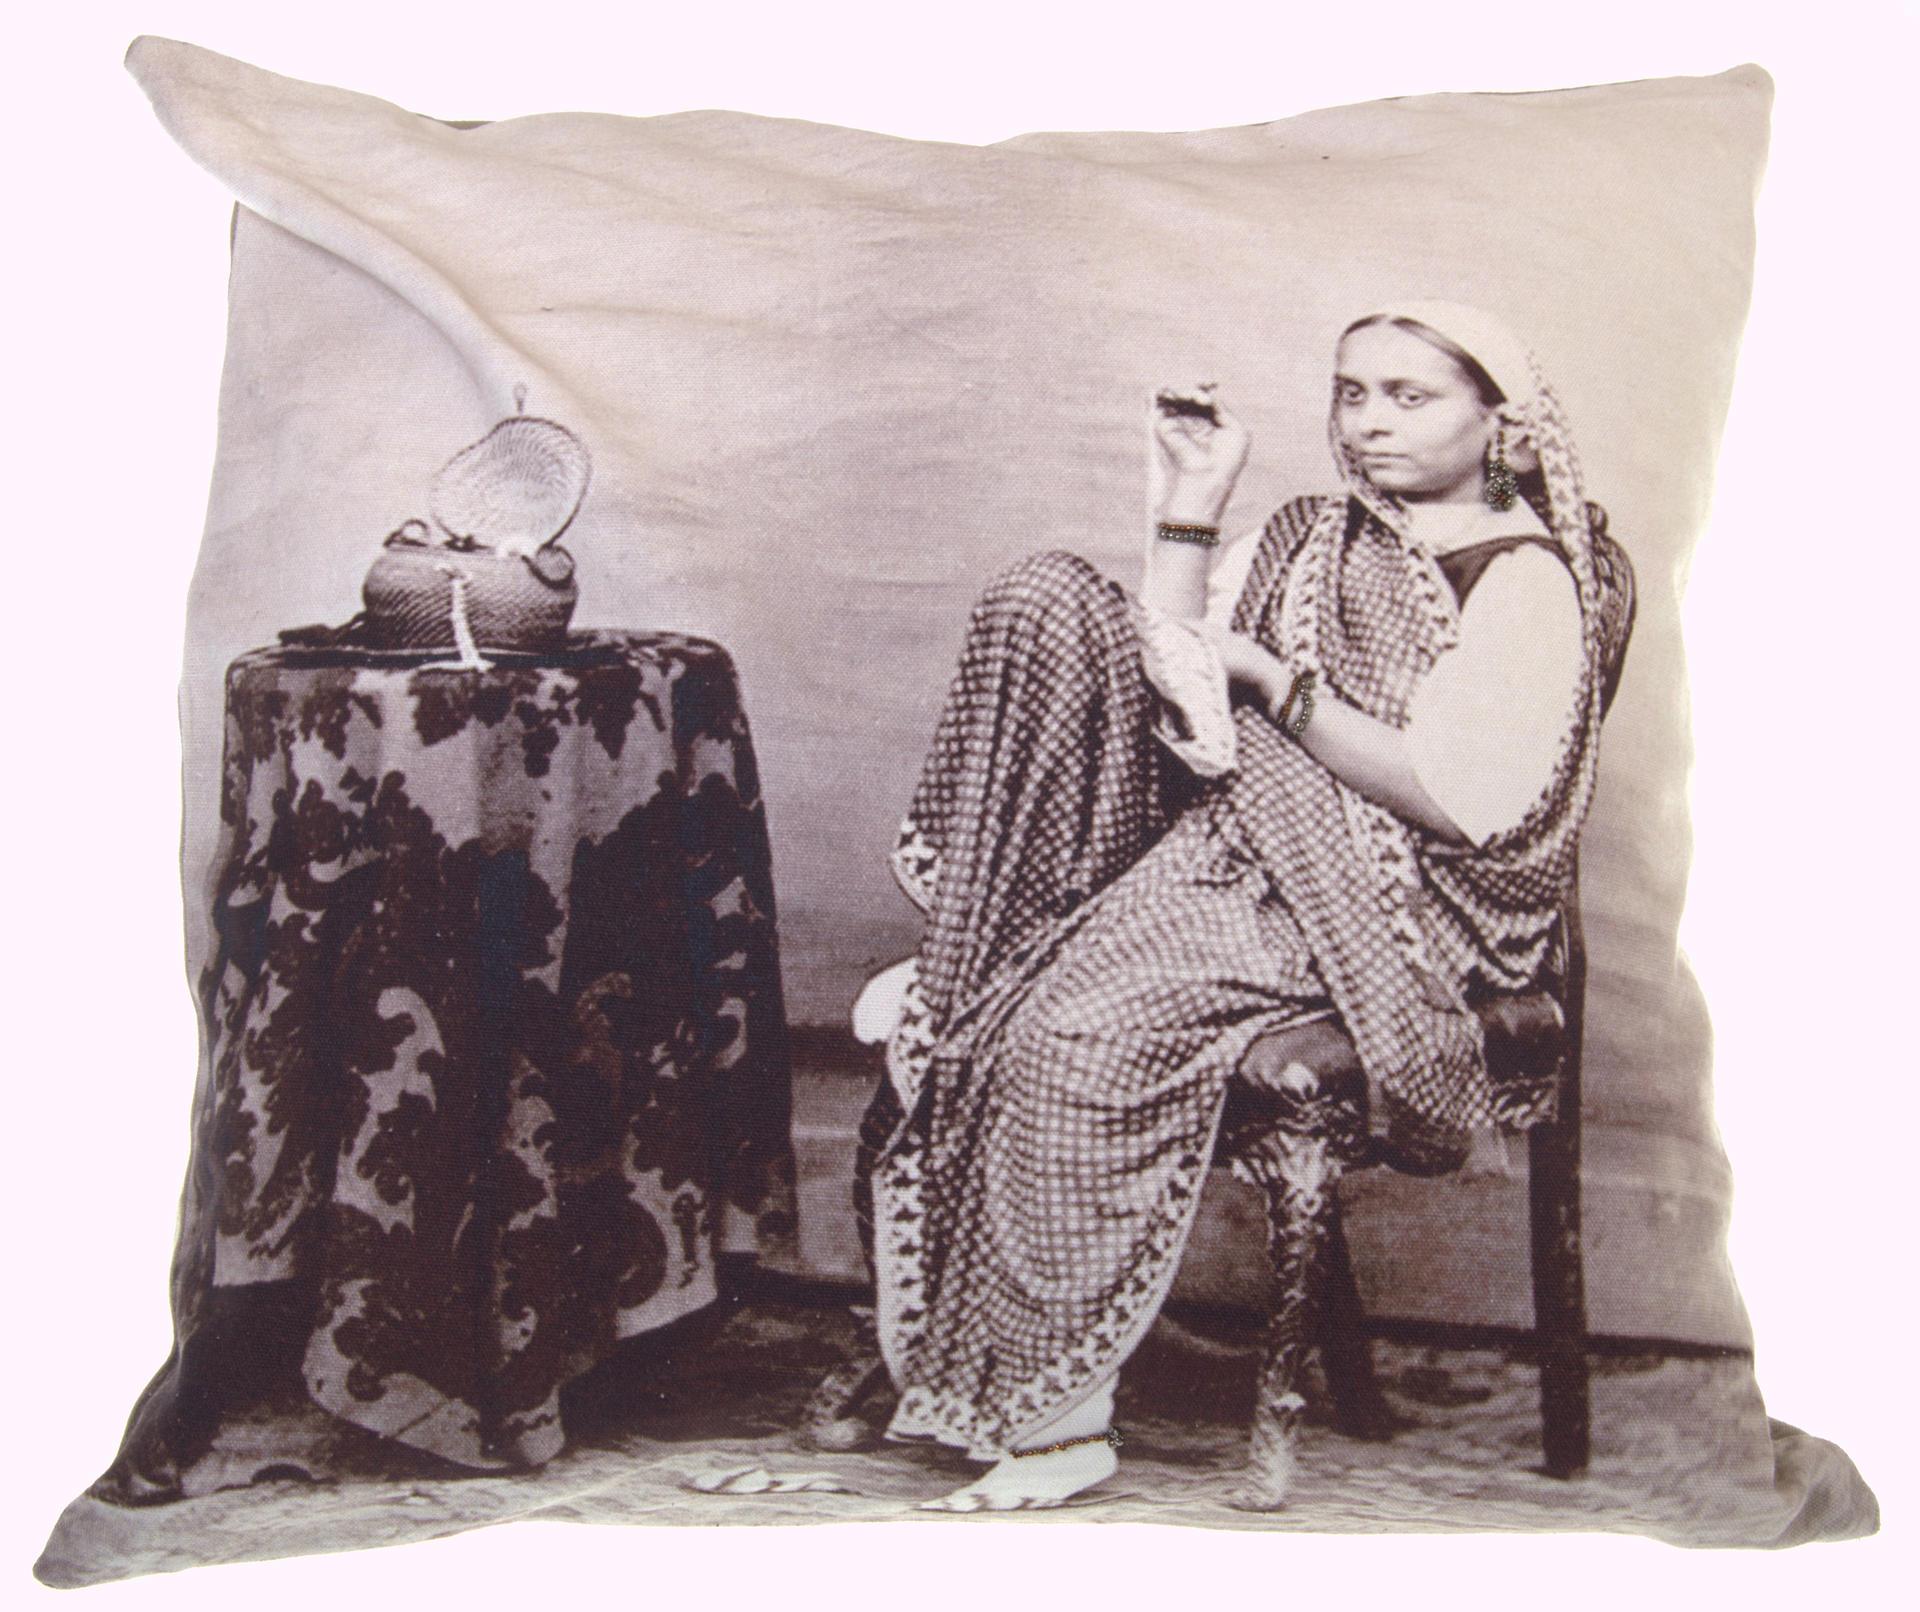 Neeru Kumar cushion cover with sitting woman and beads